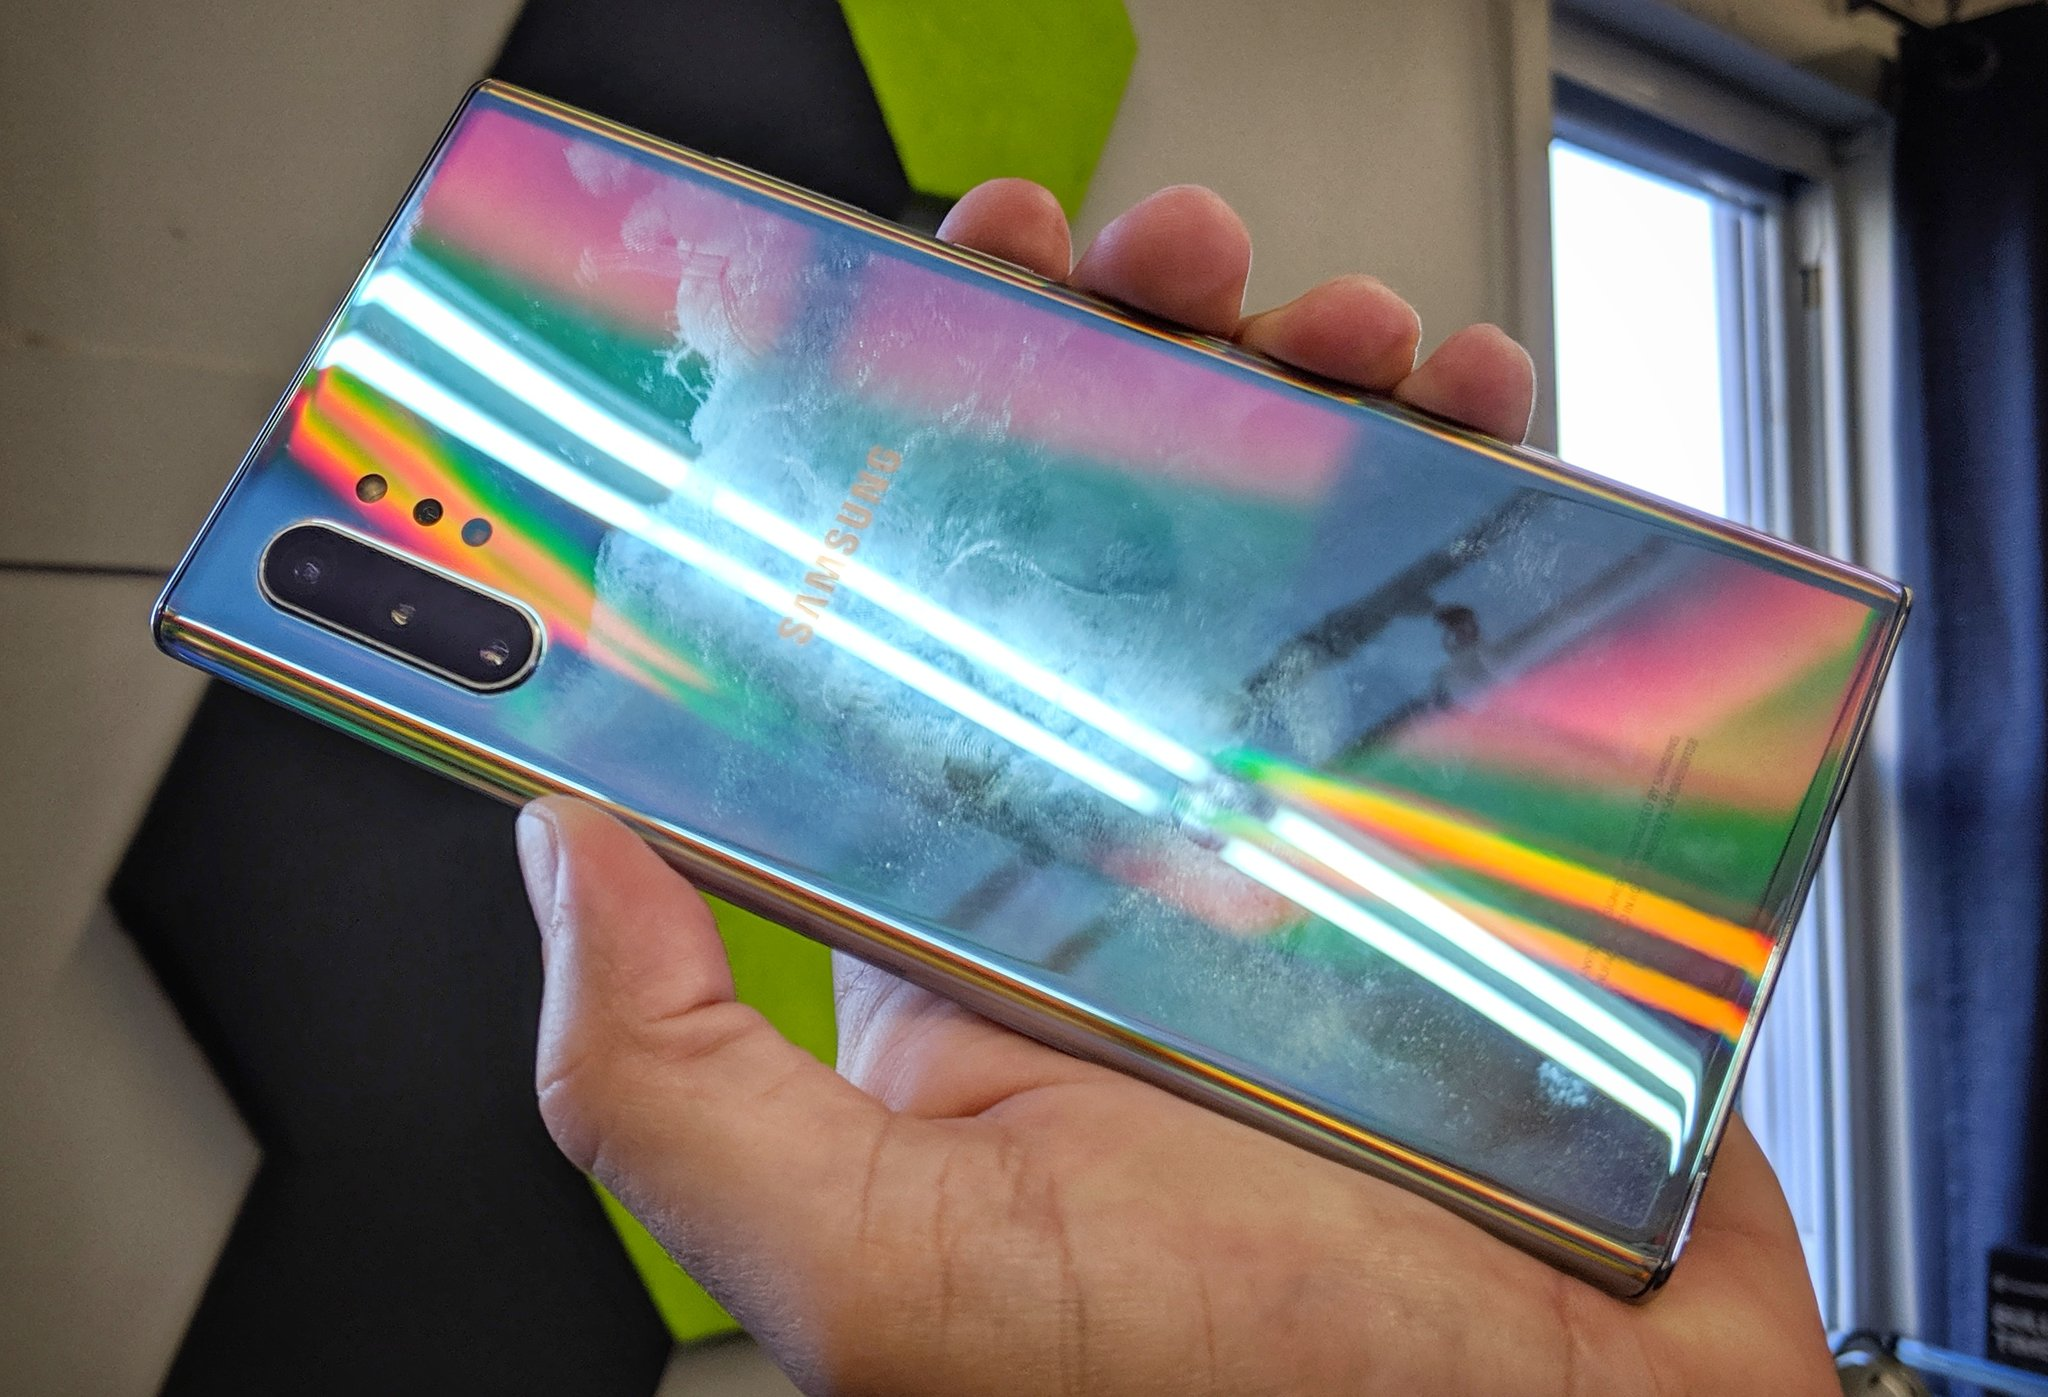 Le Samsung Galaxy Note 10 se salit facilement